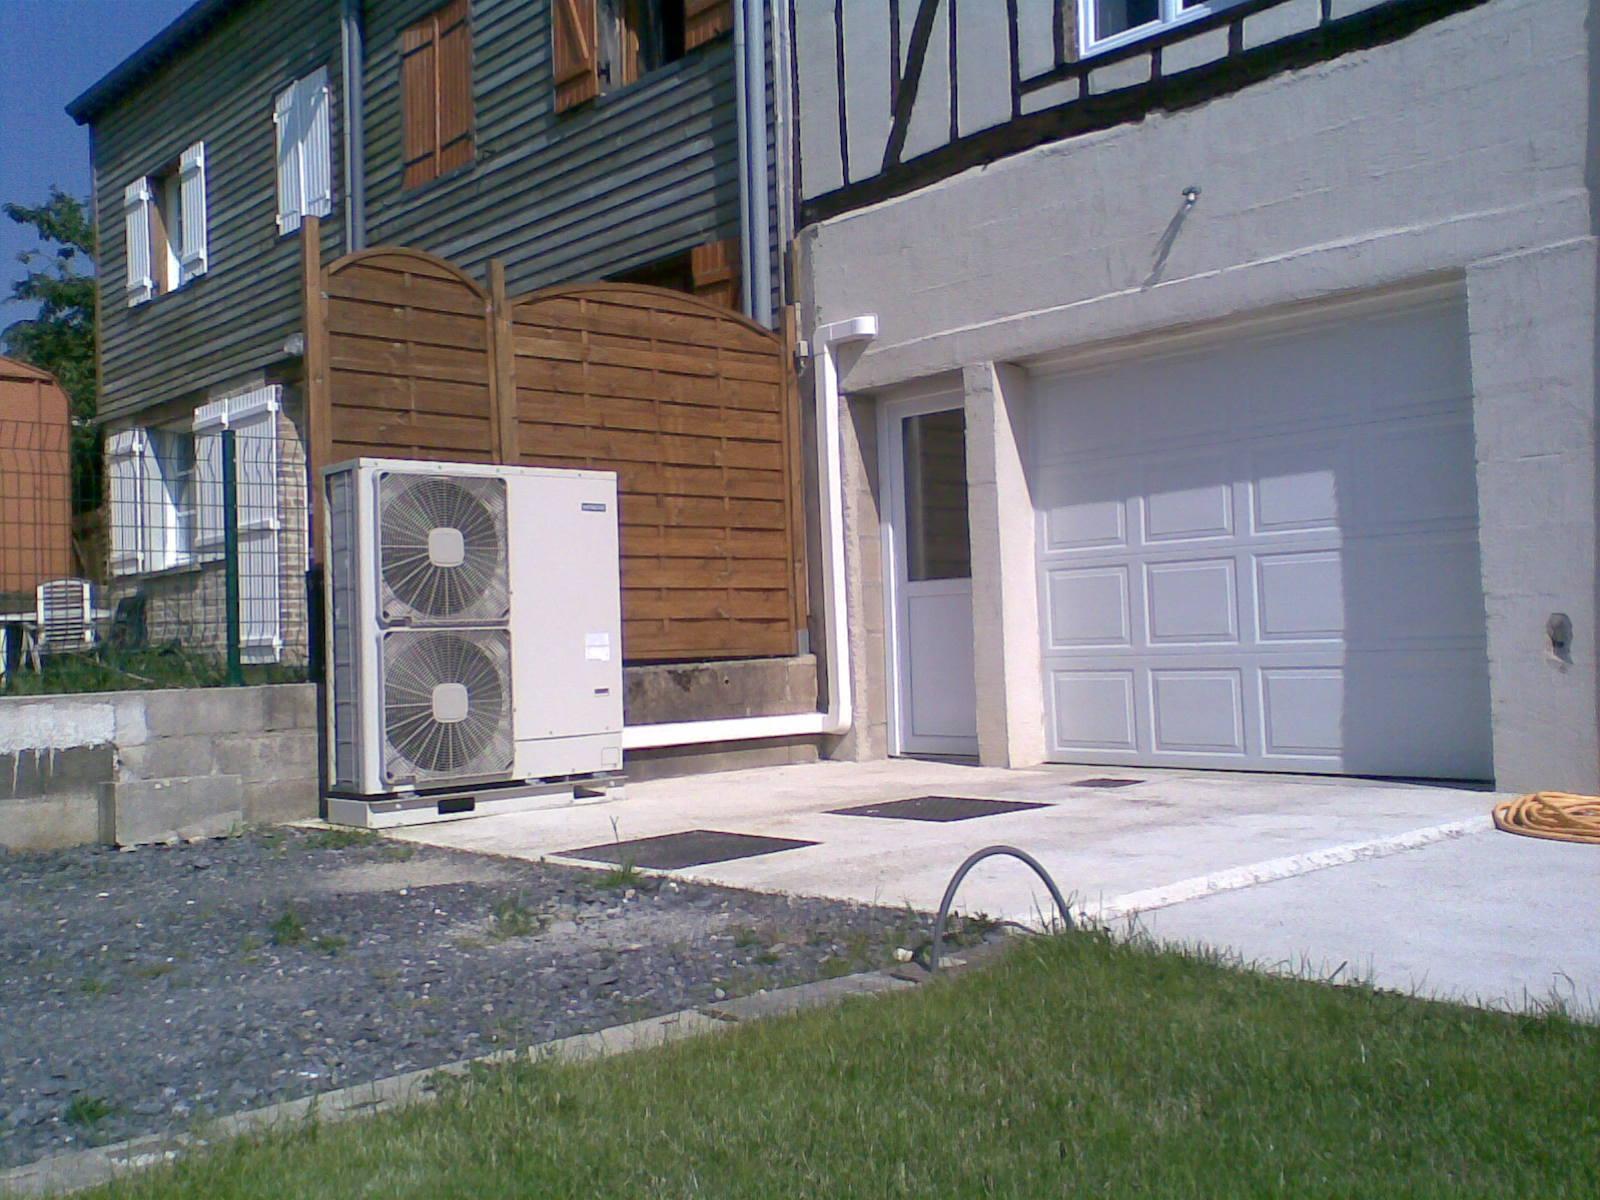 Pompe a chaleur solaire aed solaire chauffage solaire for Chauffer sa piscine au solaire